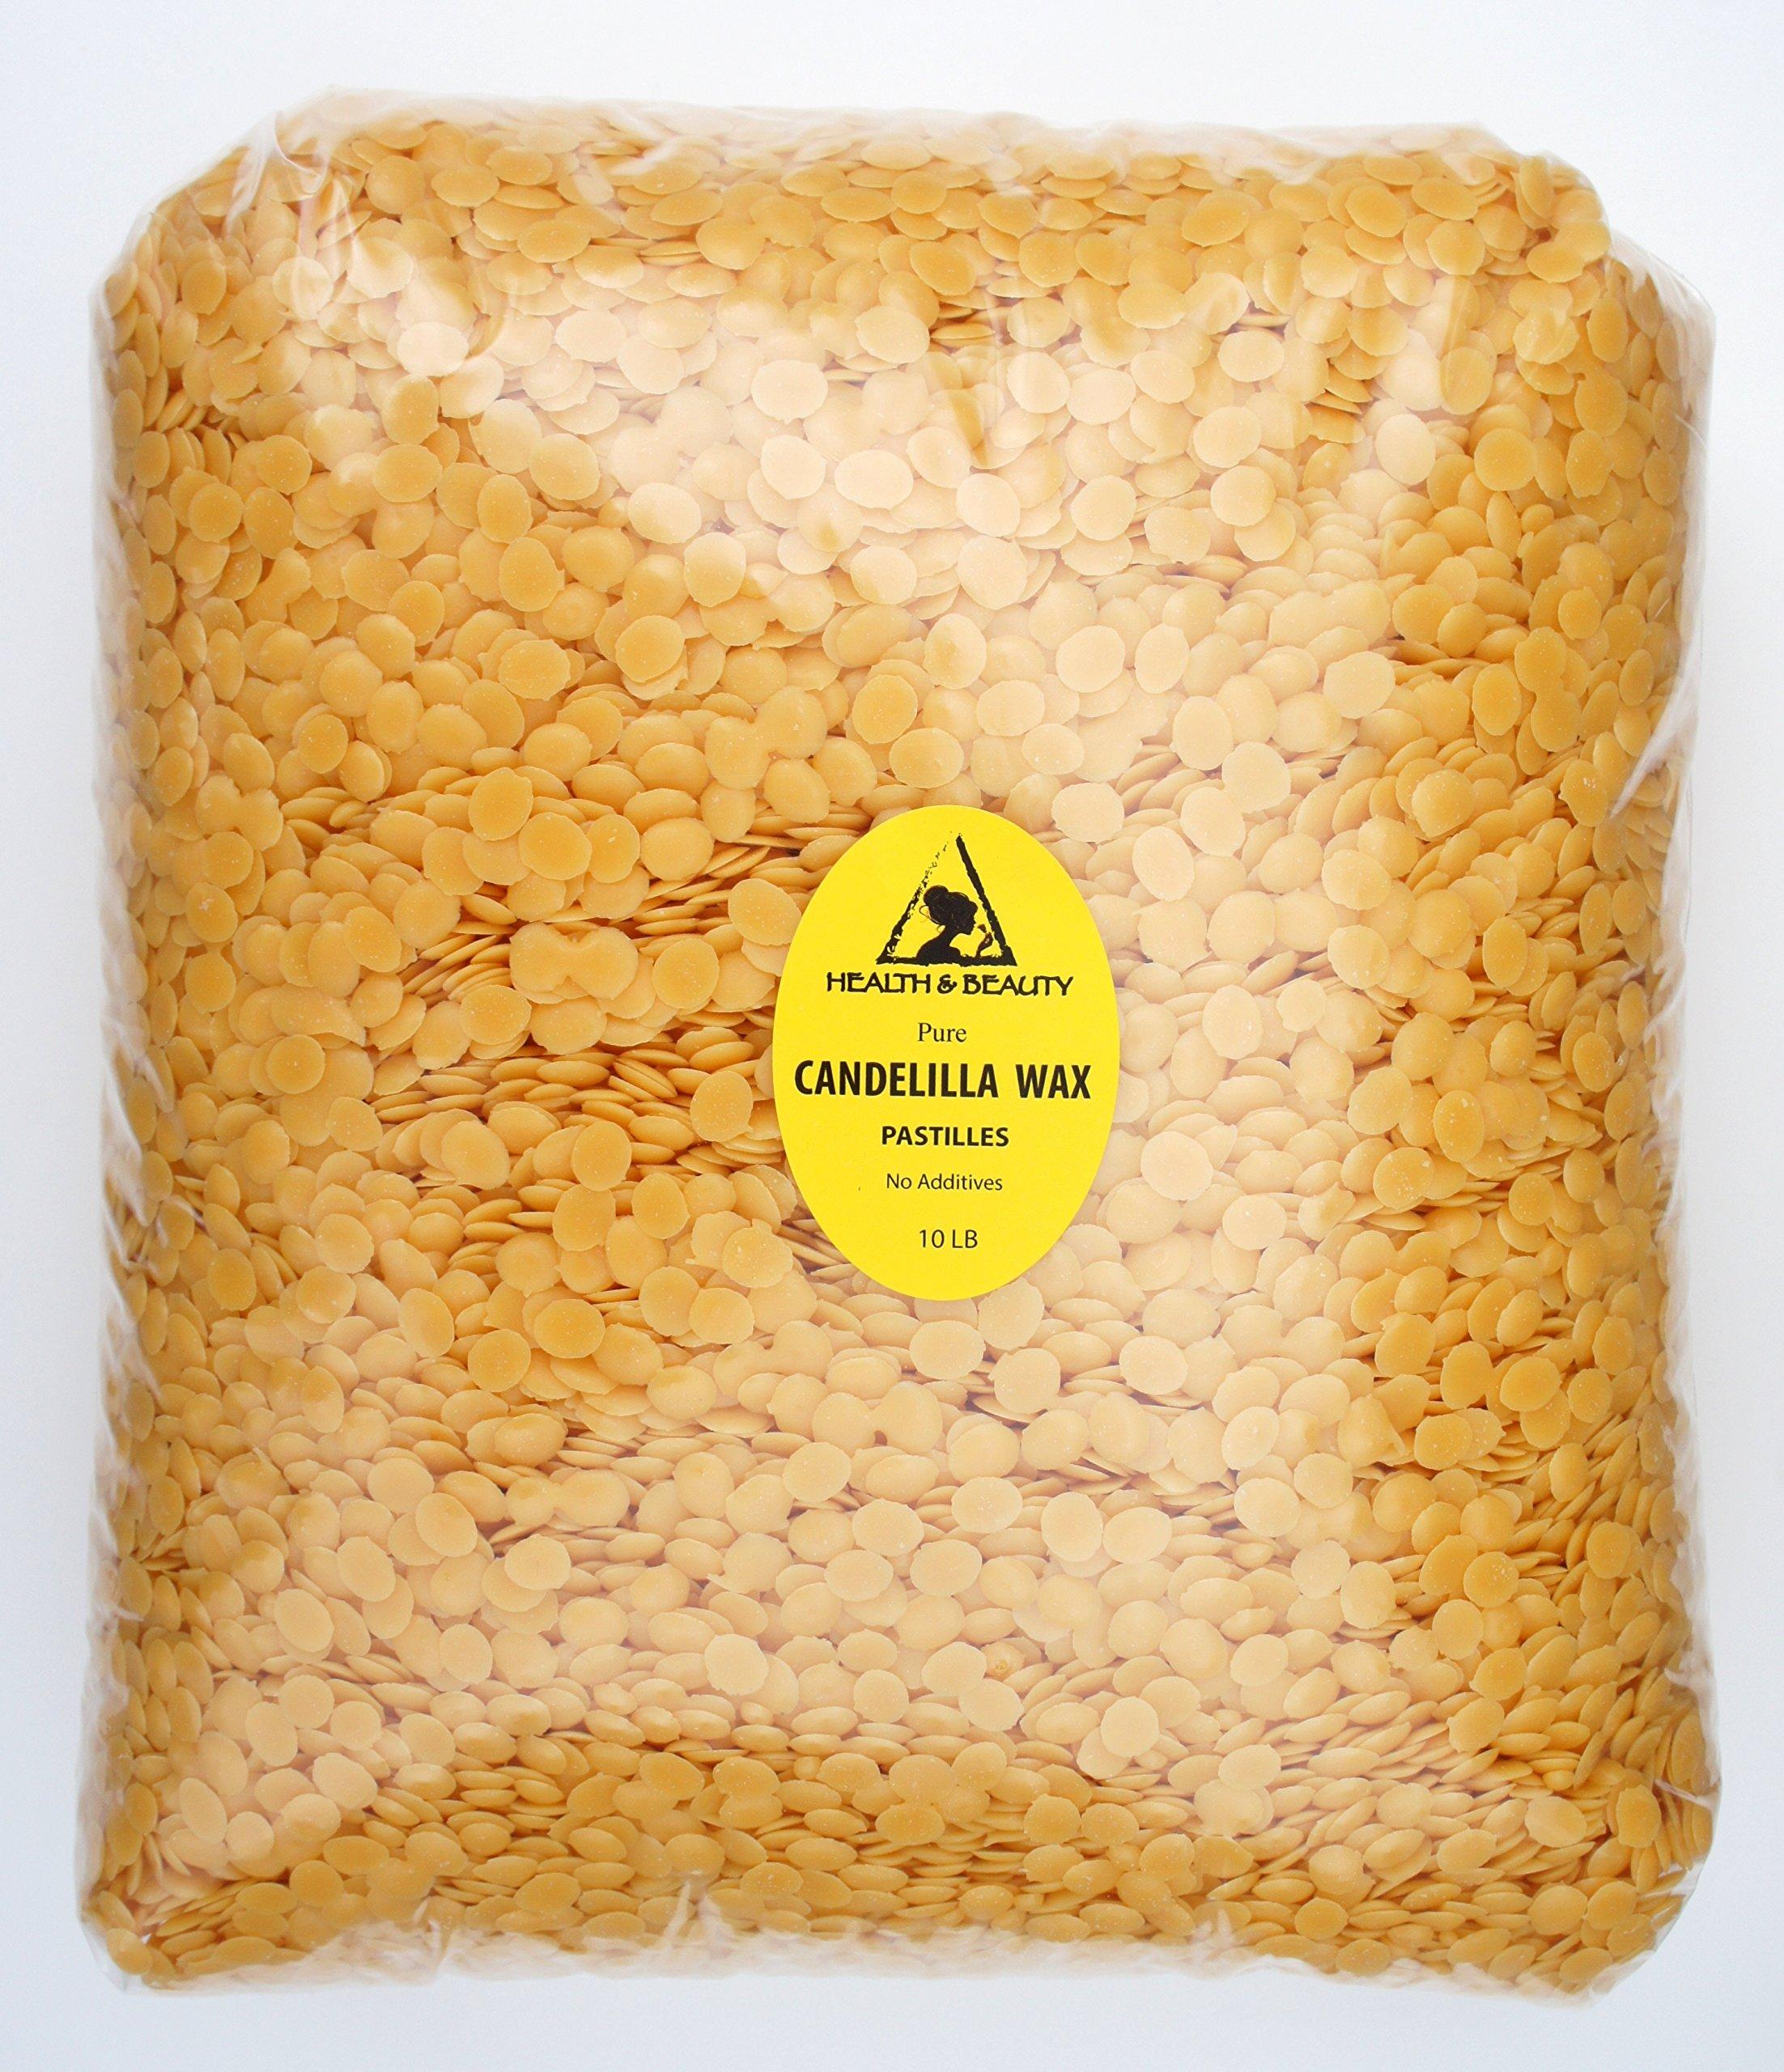 Candelilla Wax Flakes Organic Vegan Pastilles Beards Premium Prime Grade A 100% Pure 10 LB by H&B Oils Center Co.